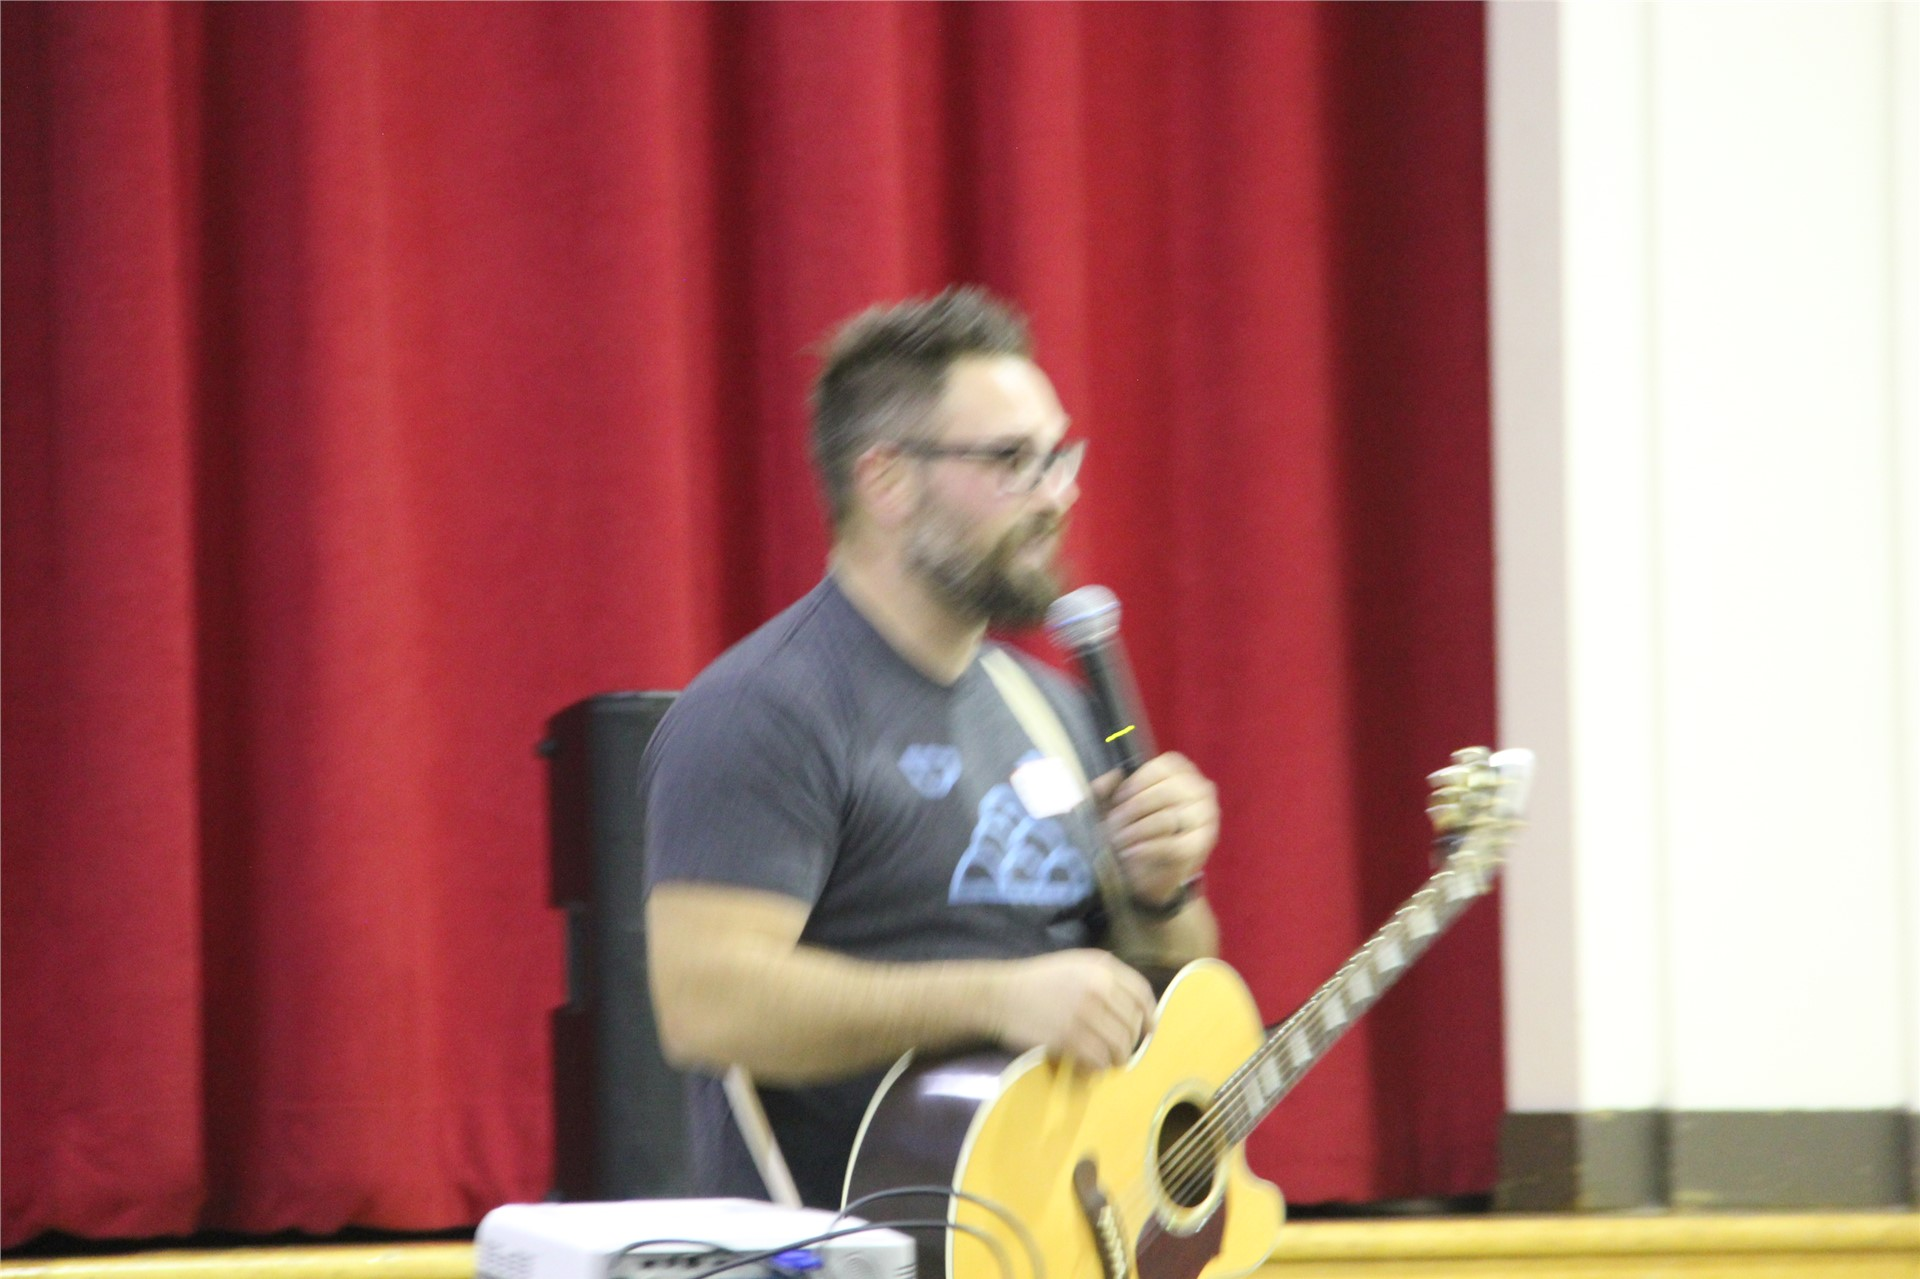 closer shot of jared campbell singing